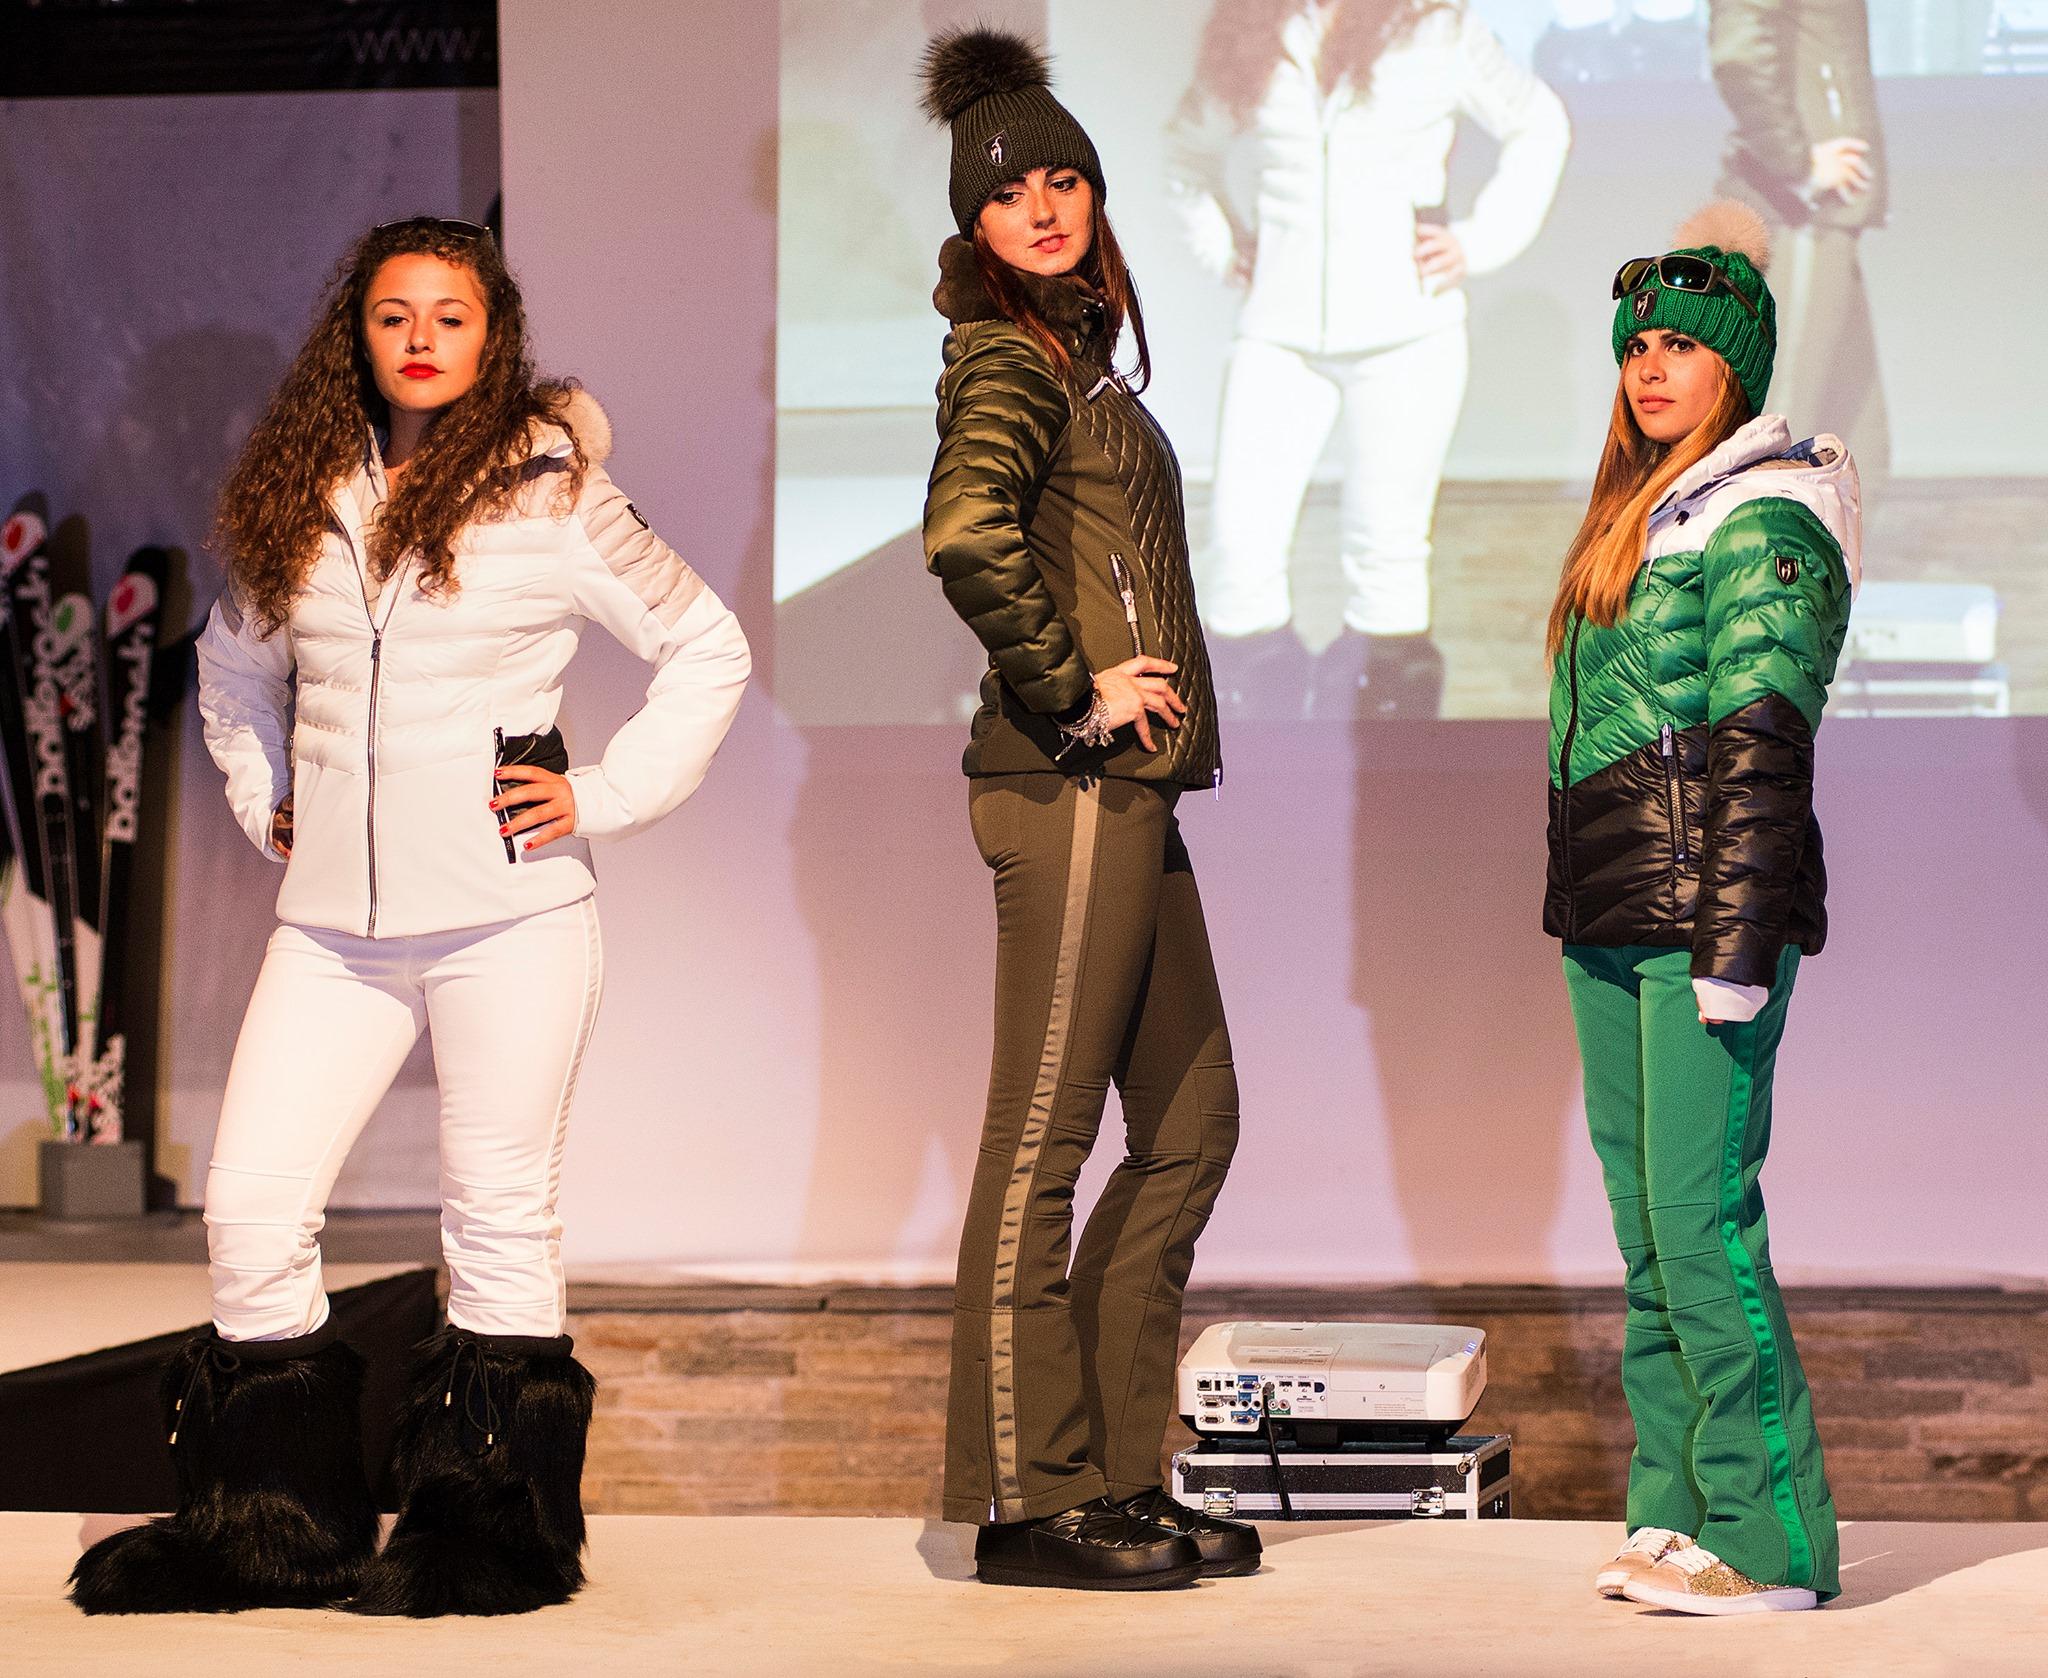 sfilata botteroski vernante 2016 sci inverno 2017 botteroski rossignol